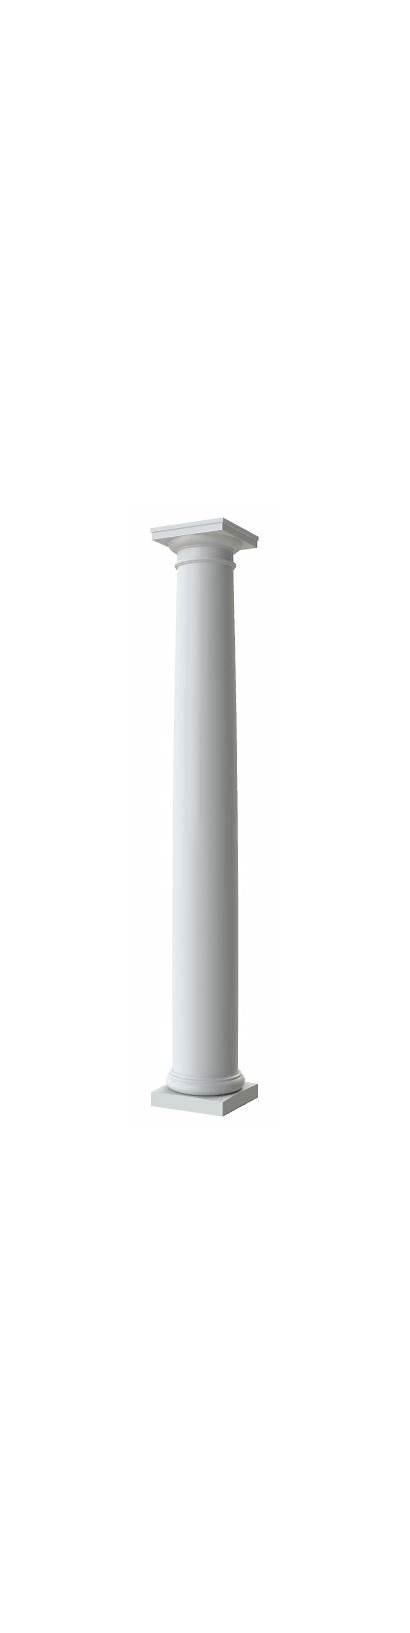 Columns Round Plain Tapered Column Fiberglass Exterior